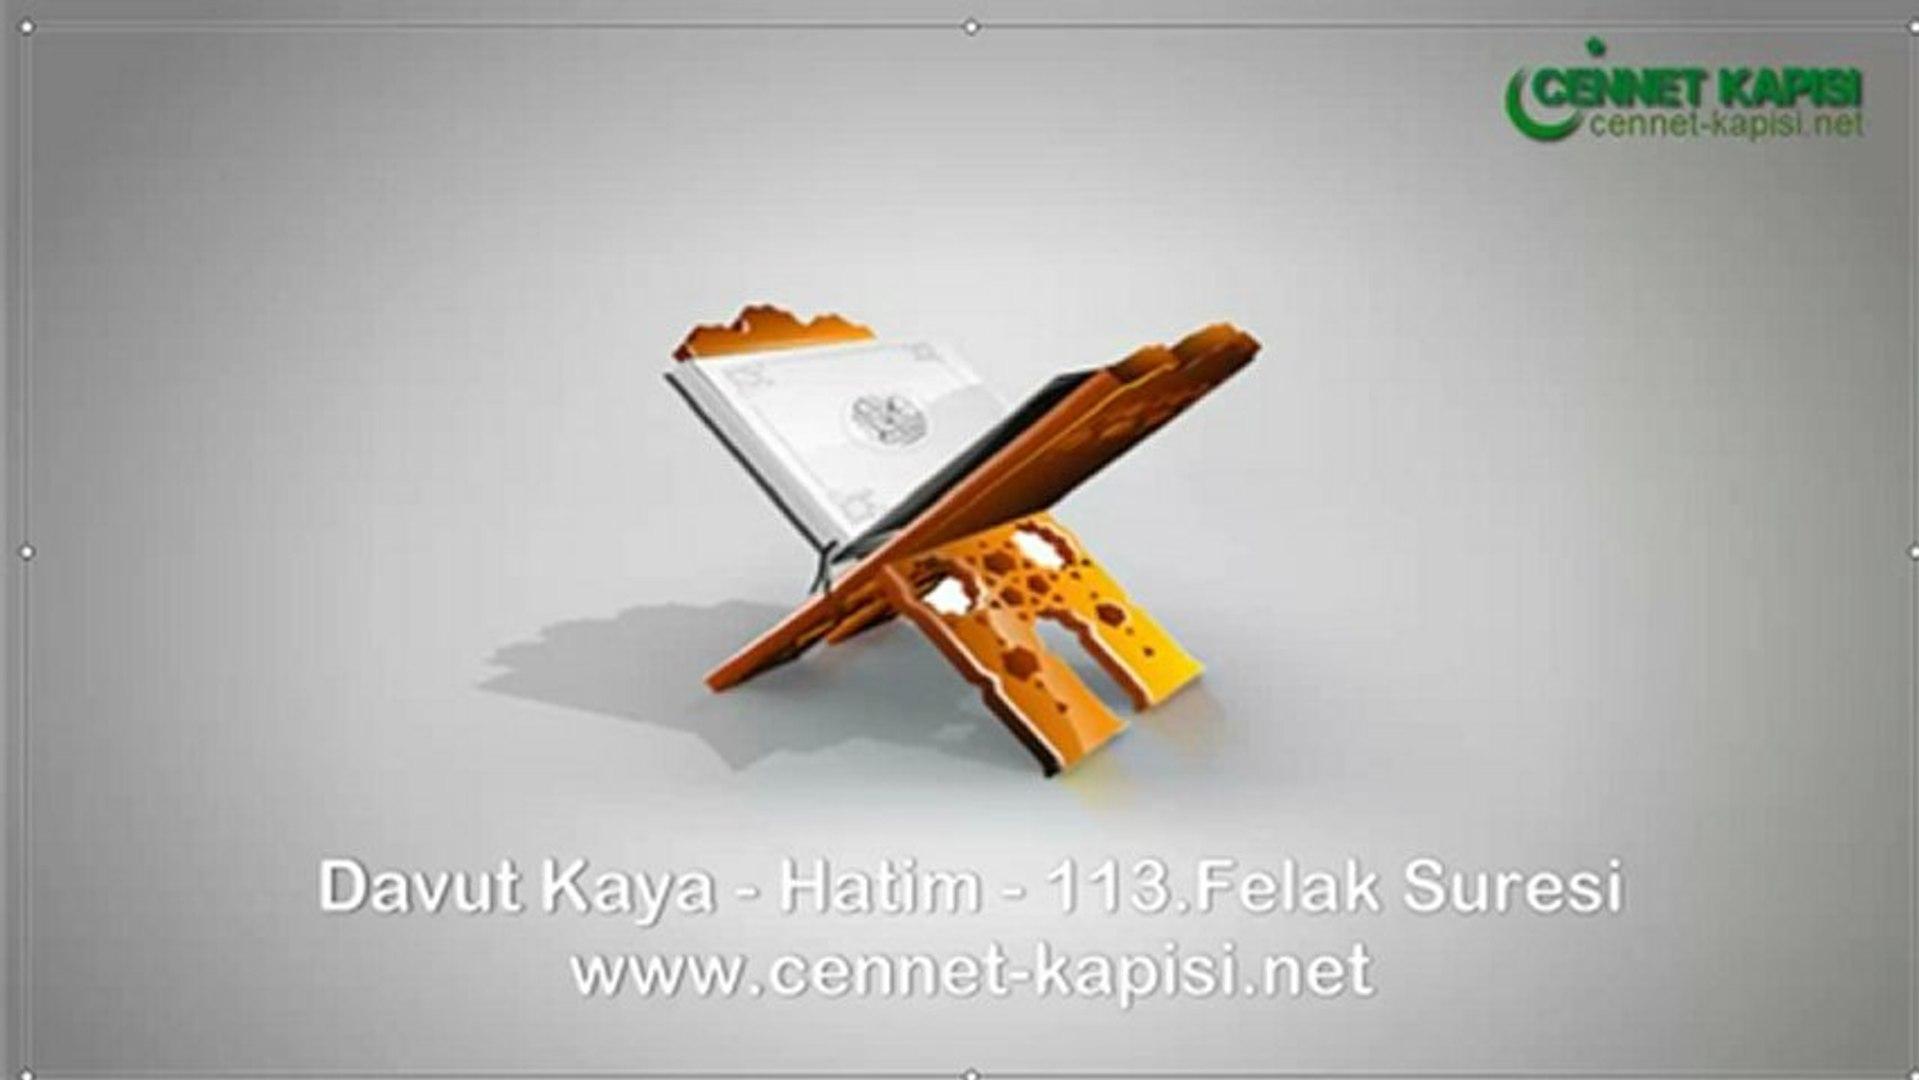 Davut Kaya - Felak Suresi - Kuran'i Kerim